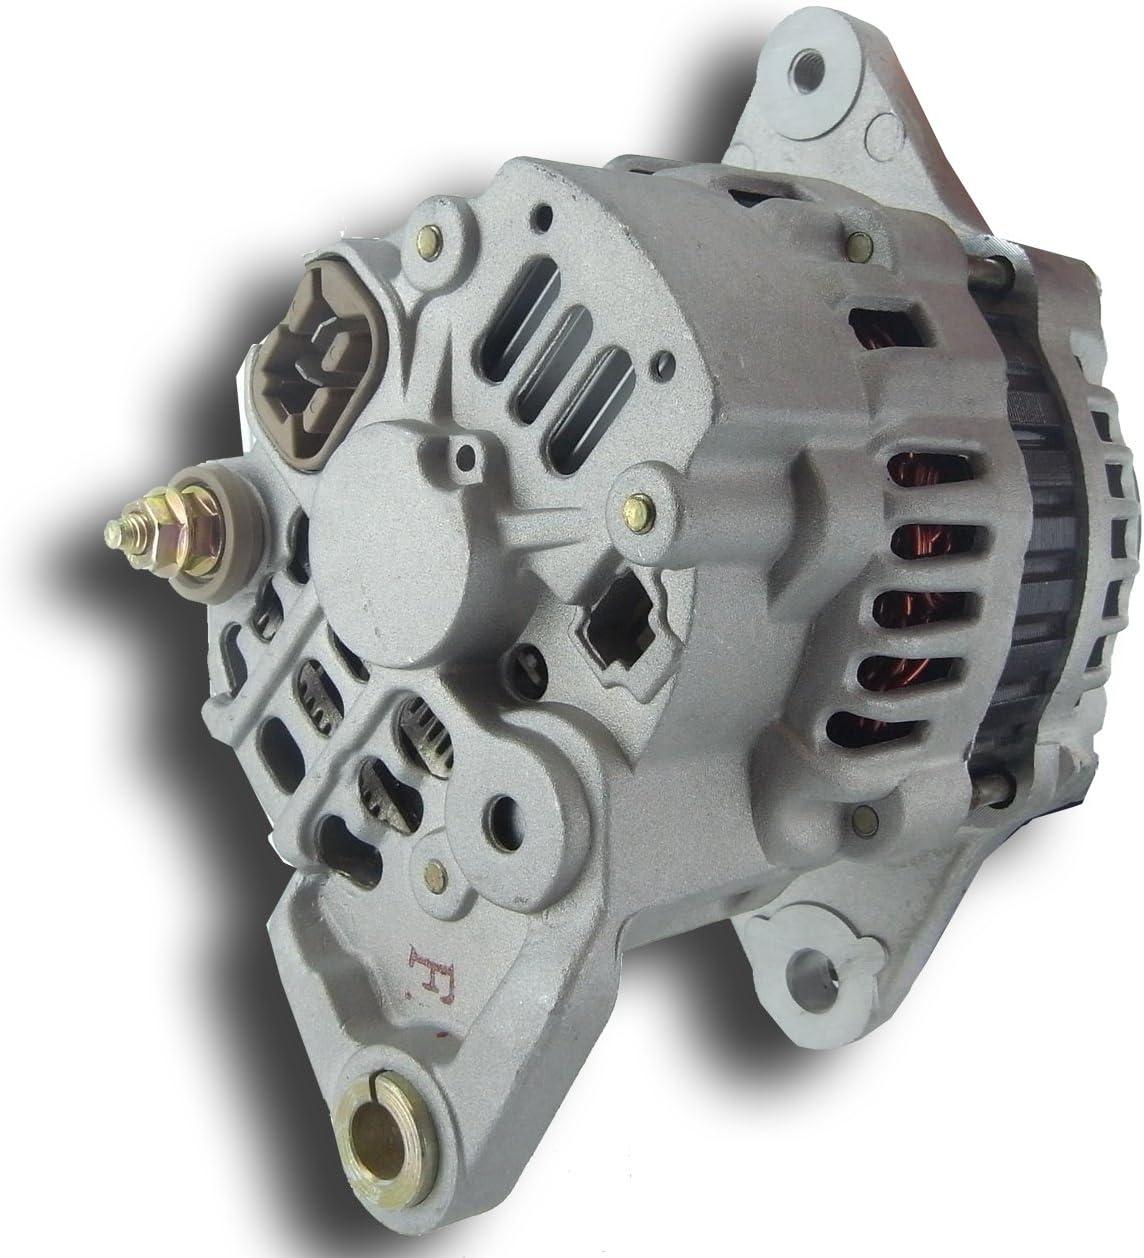 New Forklift Alternator Yale Hyster 3123908 1500145-04 9019488-01 12138